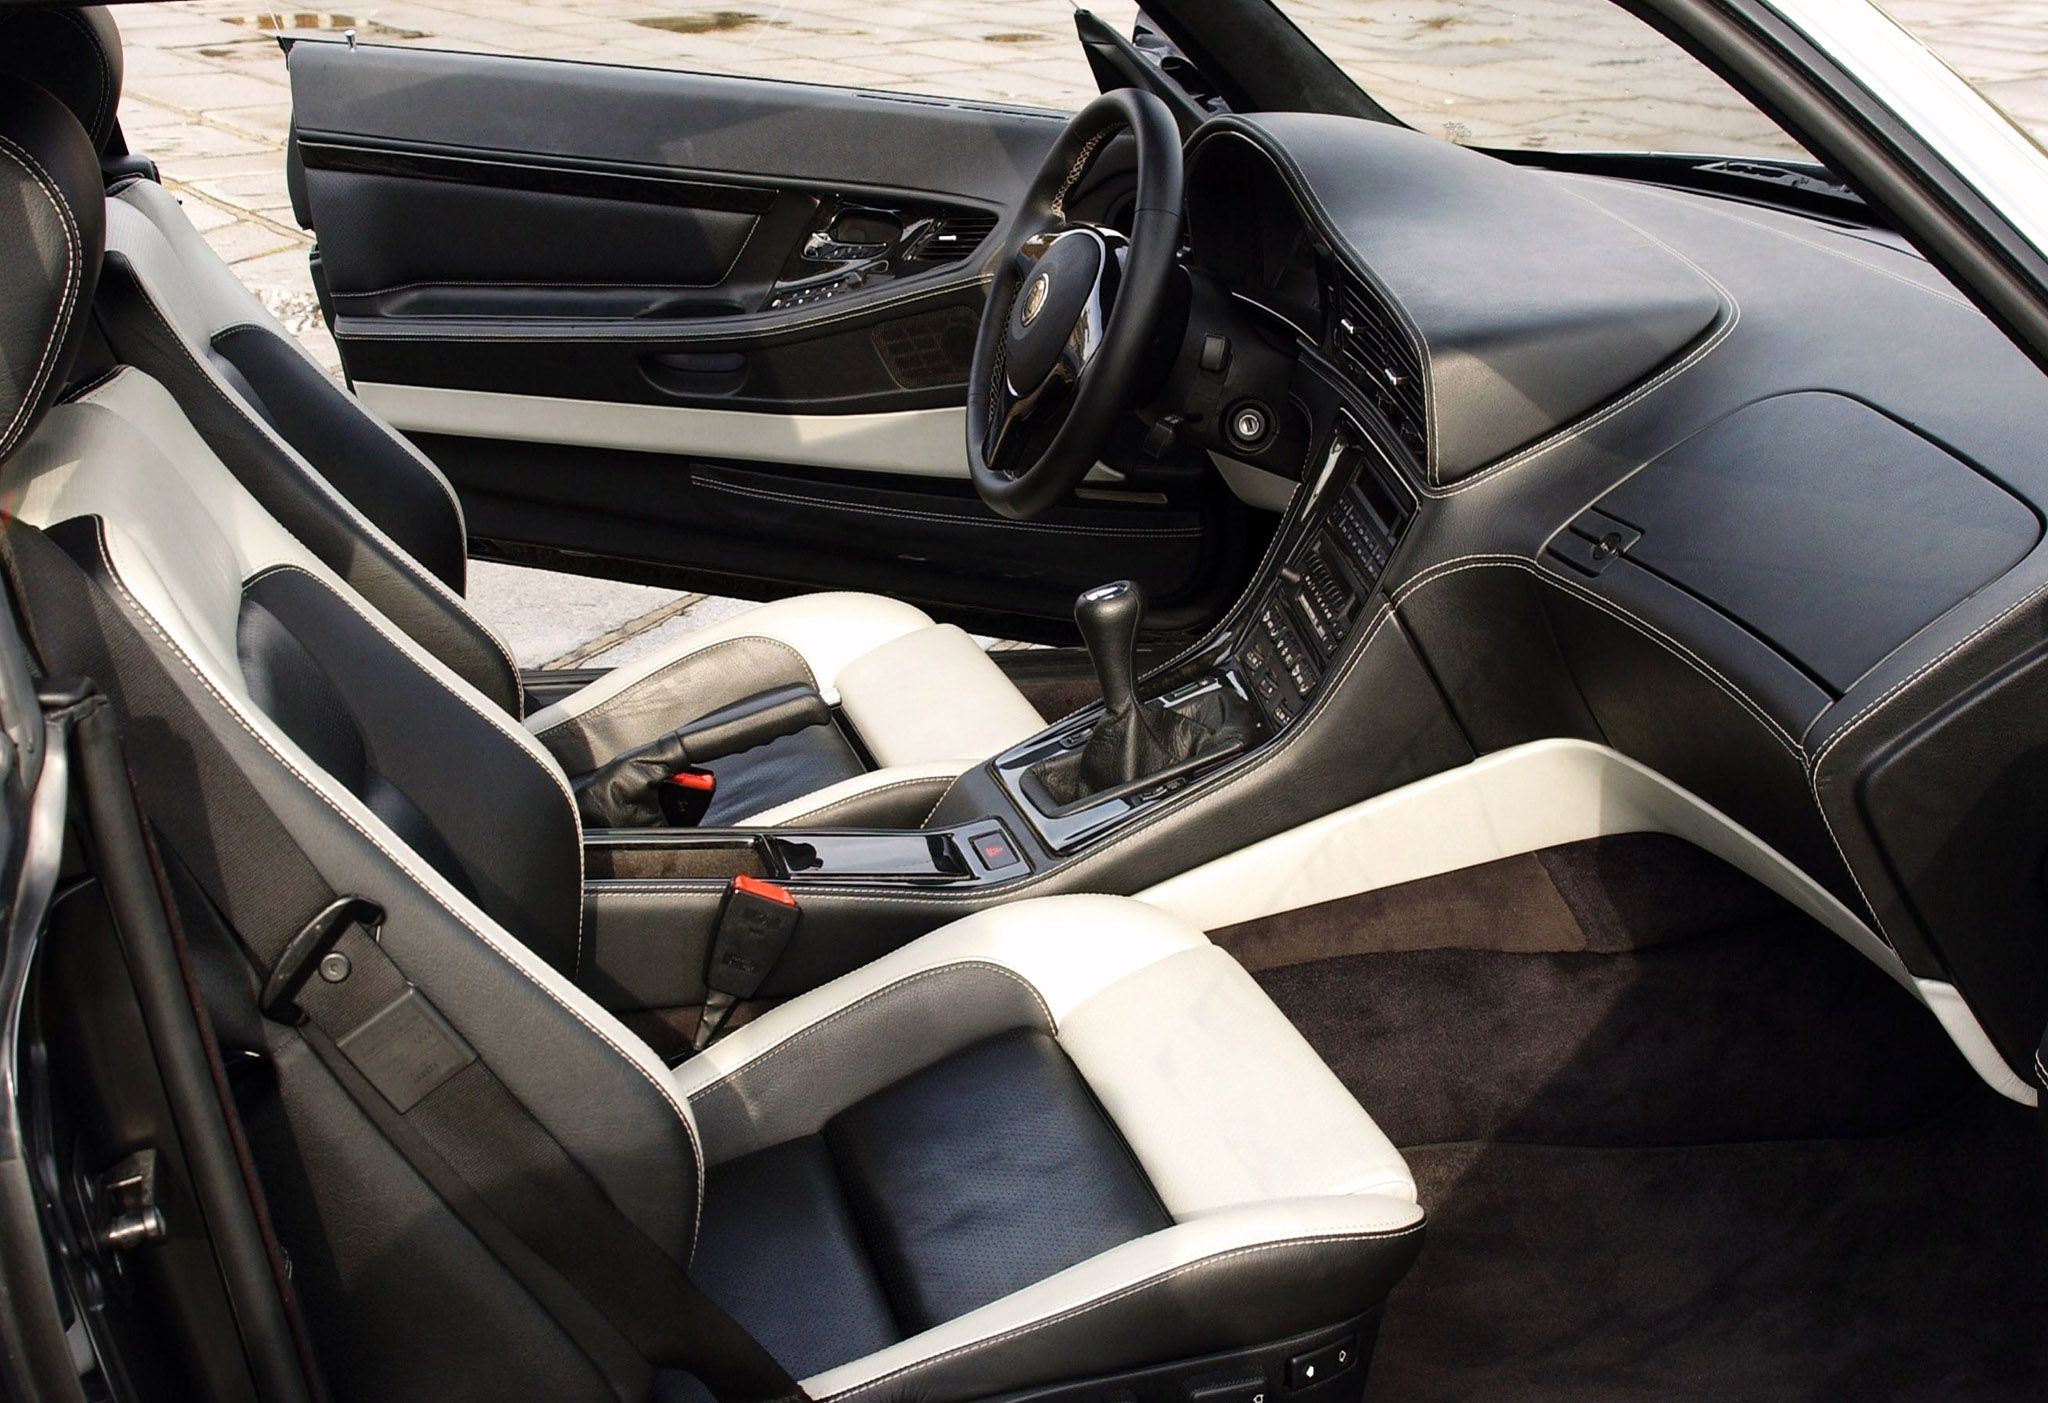 The Car Shack >> Volga GAZ V12 Coupe | Car For Sale Today